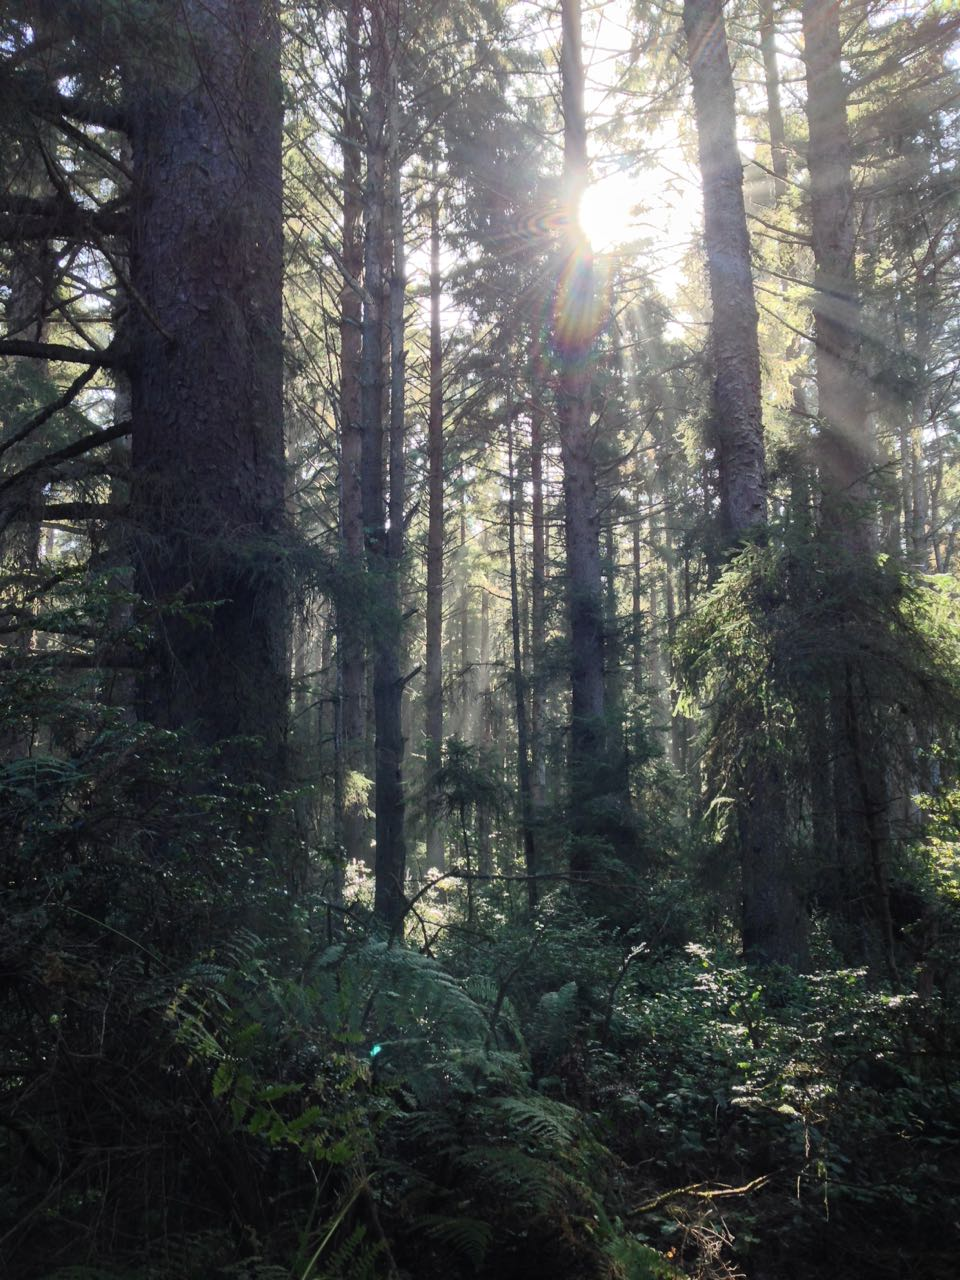 Redwoods 2017 10 08 189 Of 287